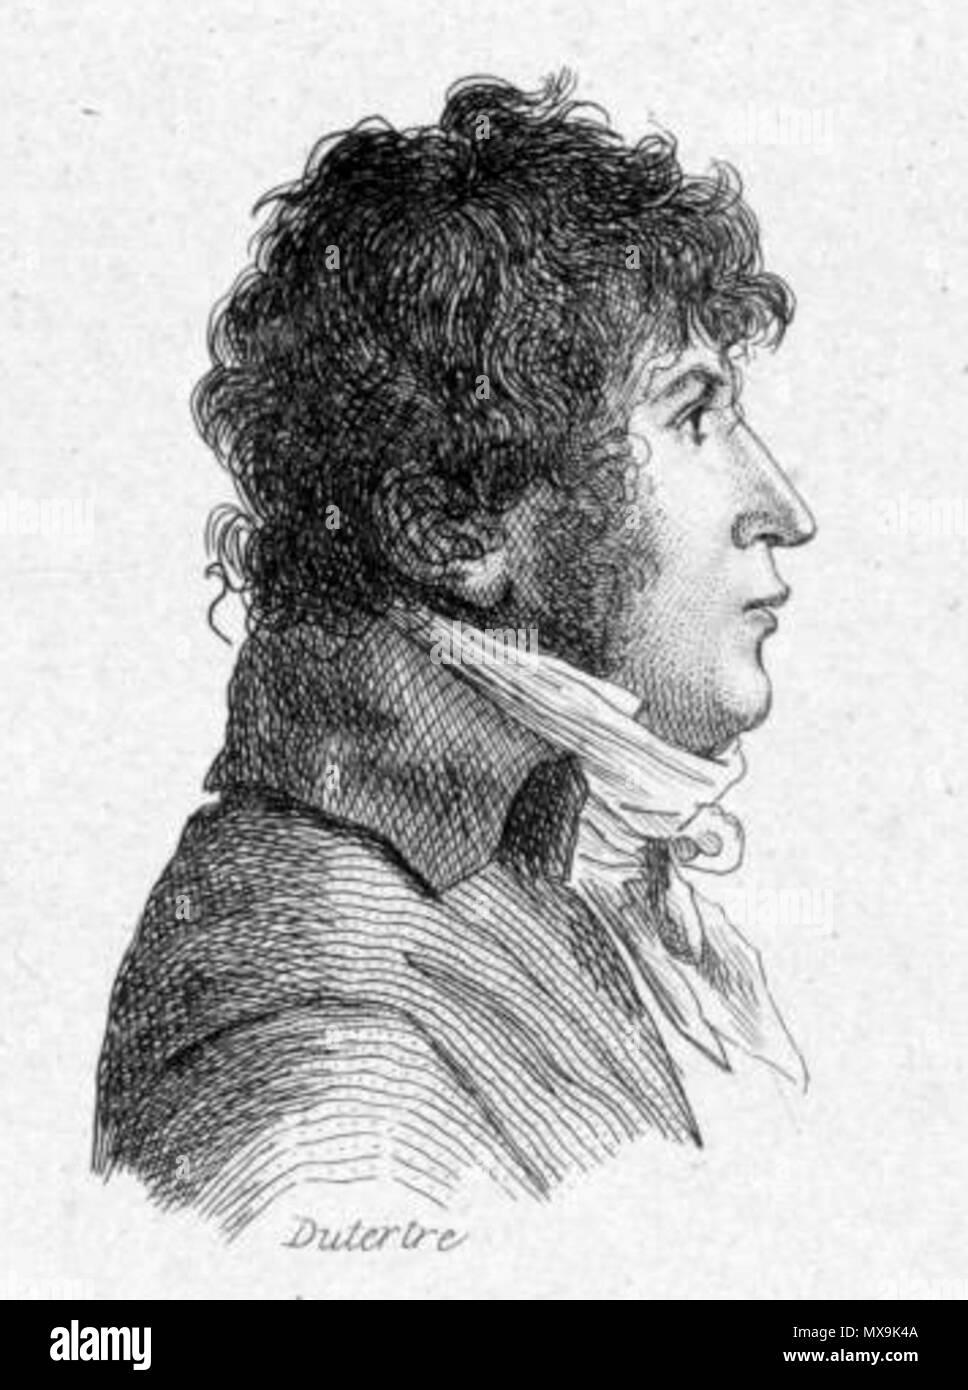 273 Henri-Joseph Rigel by André Dutertre - Stock Image